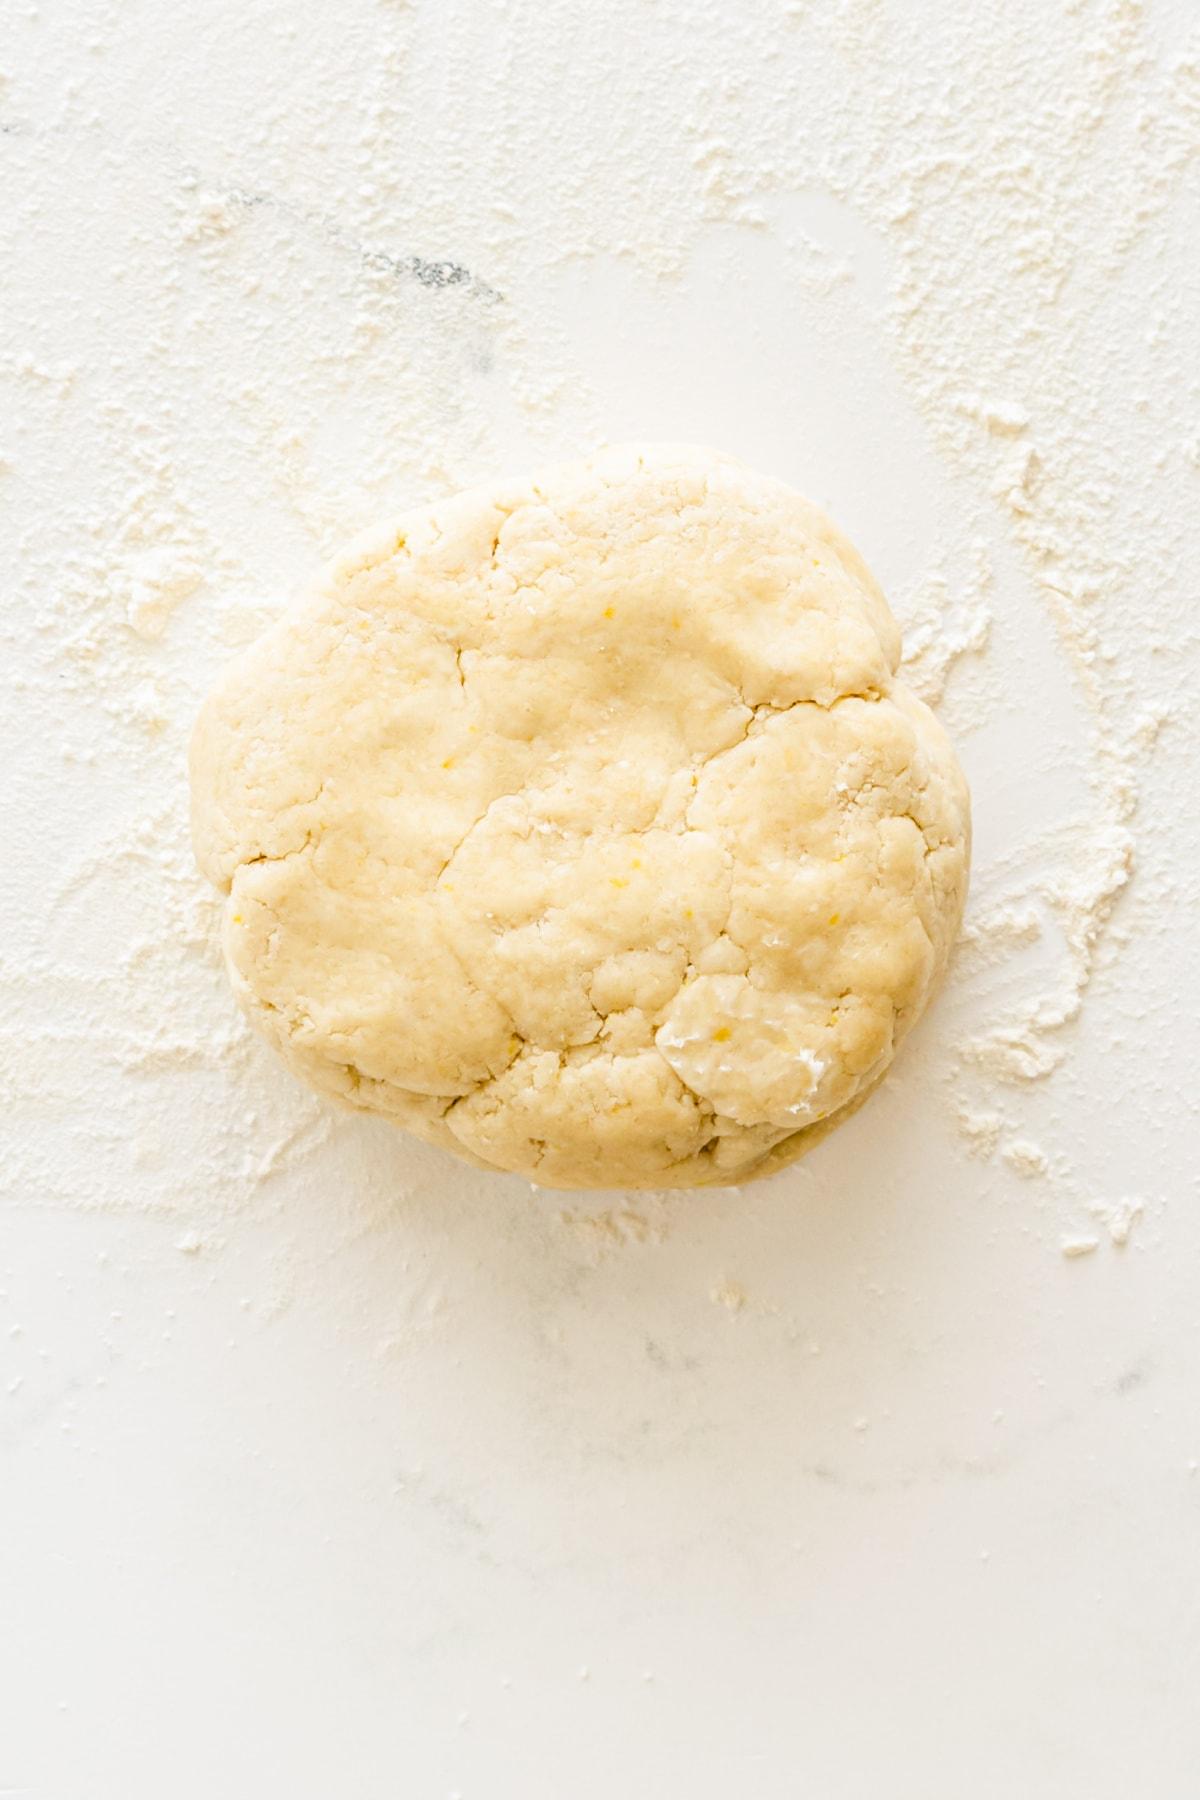 ball of pie crust dough